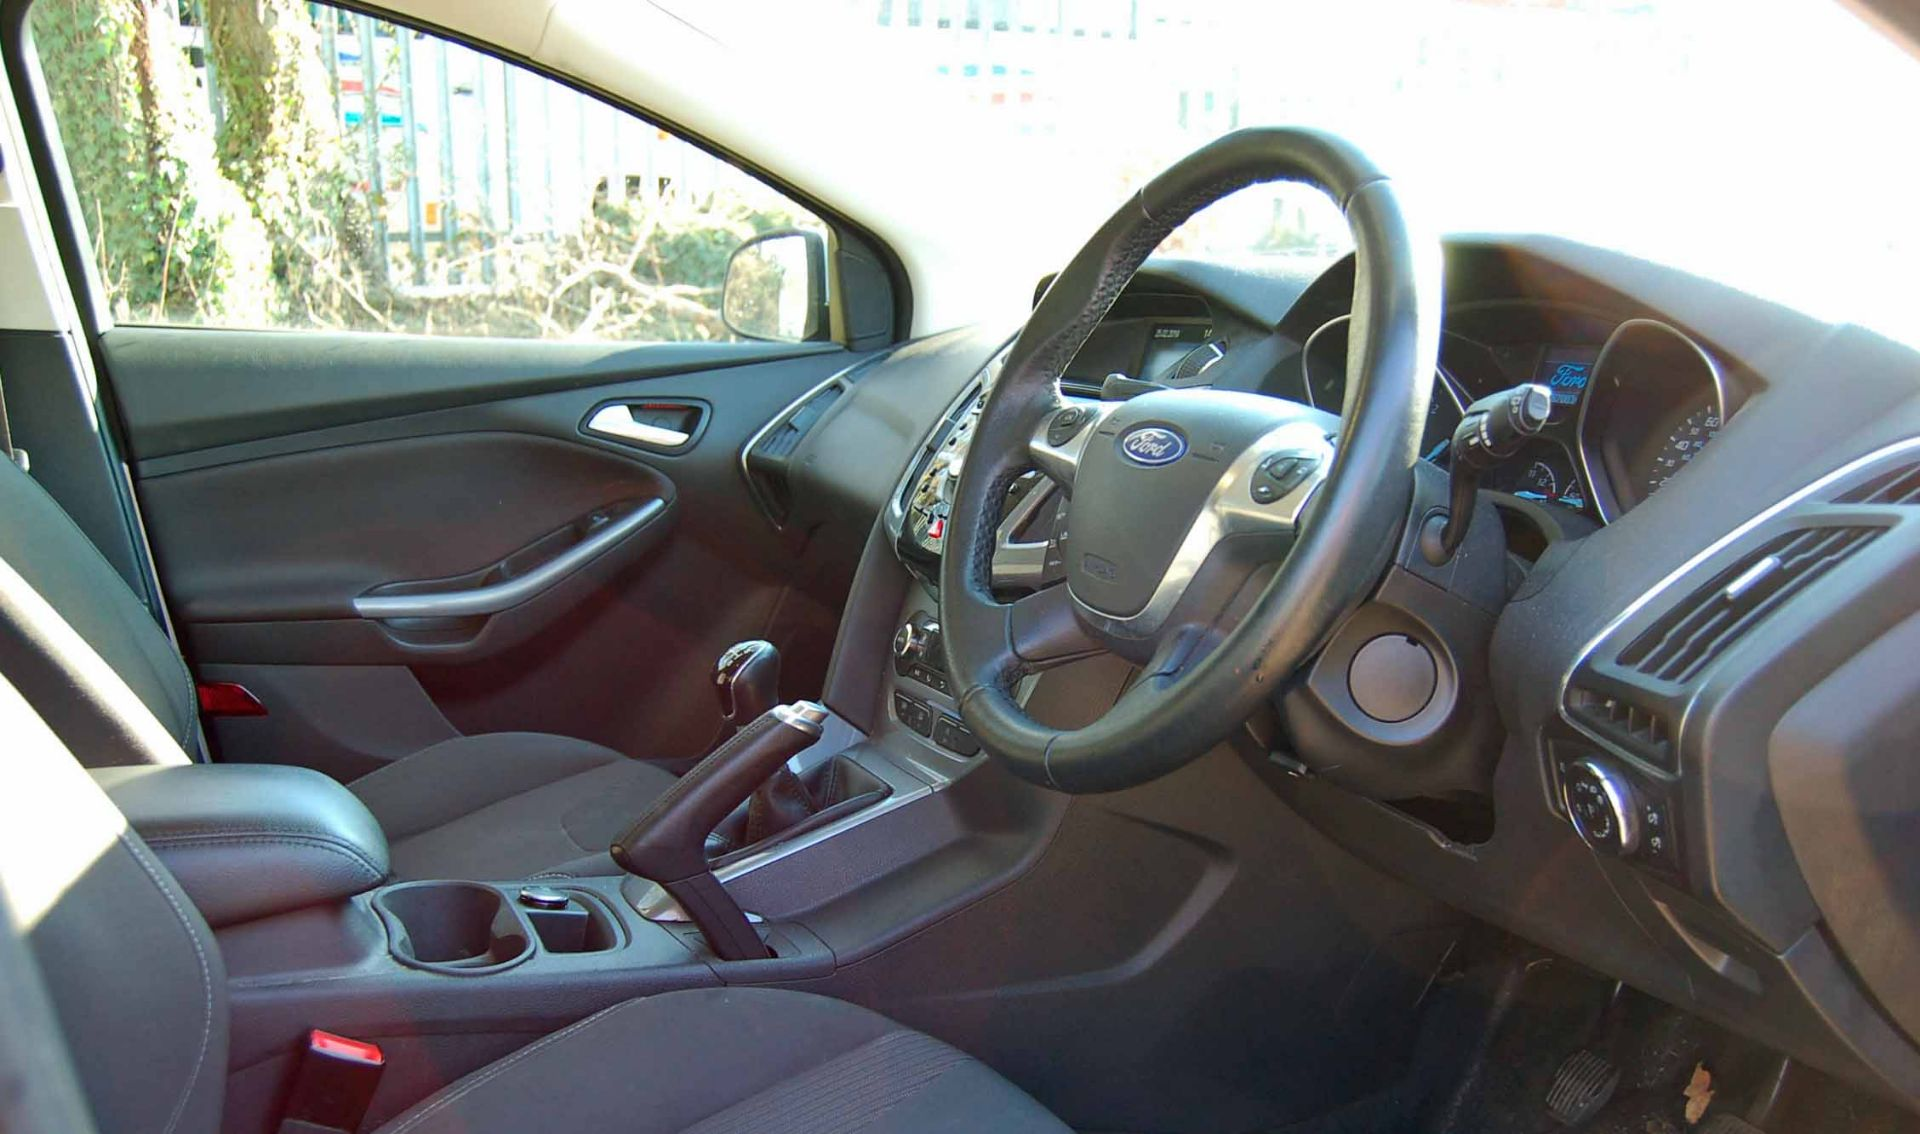 Lot 5 - A FORD Focus Titanium 1.6 TDCI 115 Diesel Hatchback, Registration No. HN62 NWO (2012), First